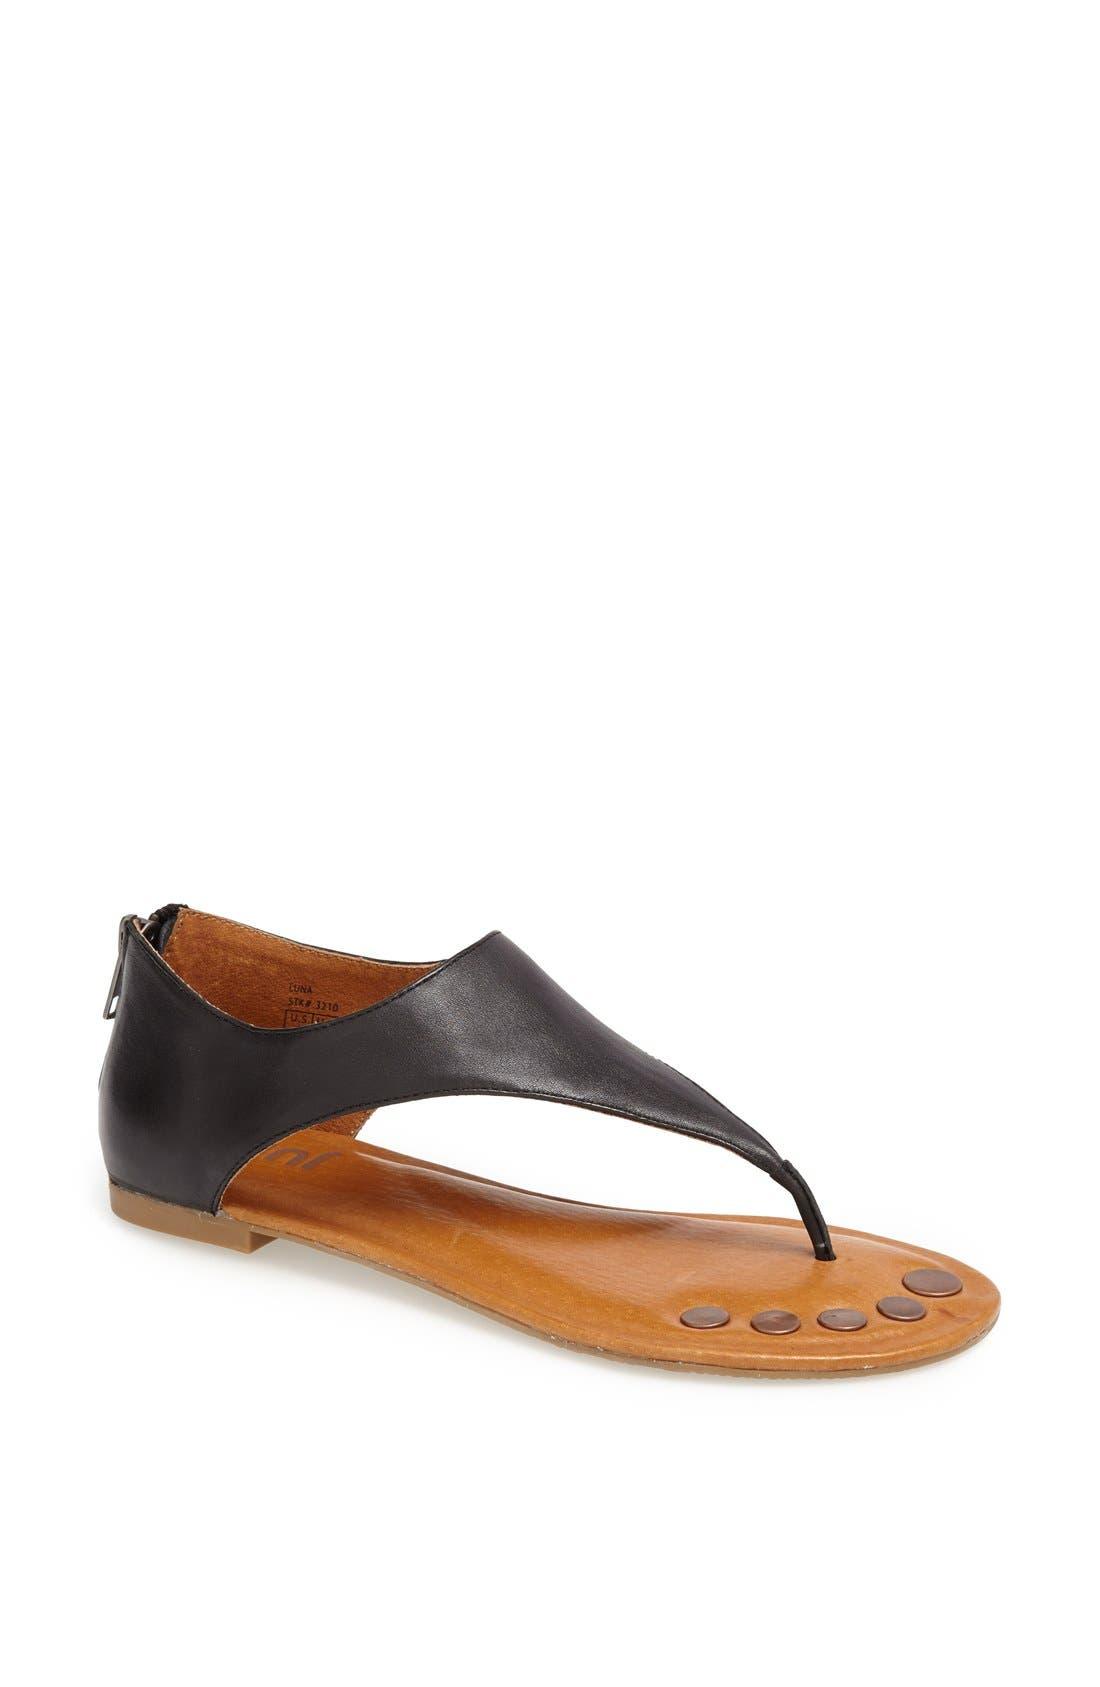 'Luna' Metallic Leather Thong Sandal,                             Main thumbnail 1, color,                             010